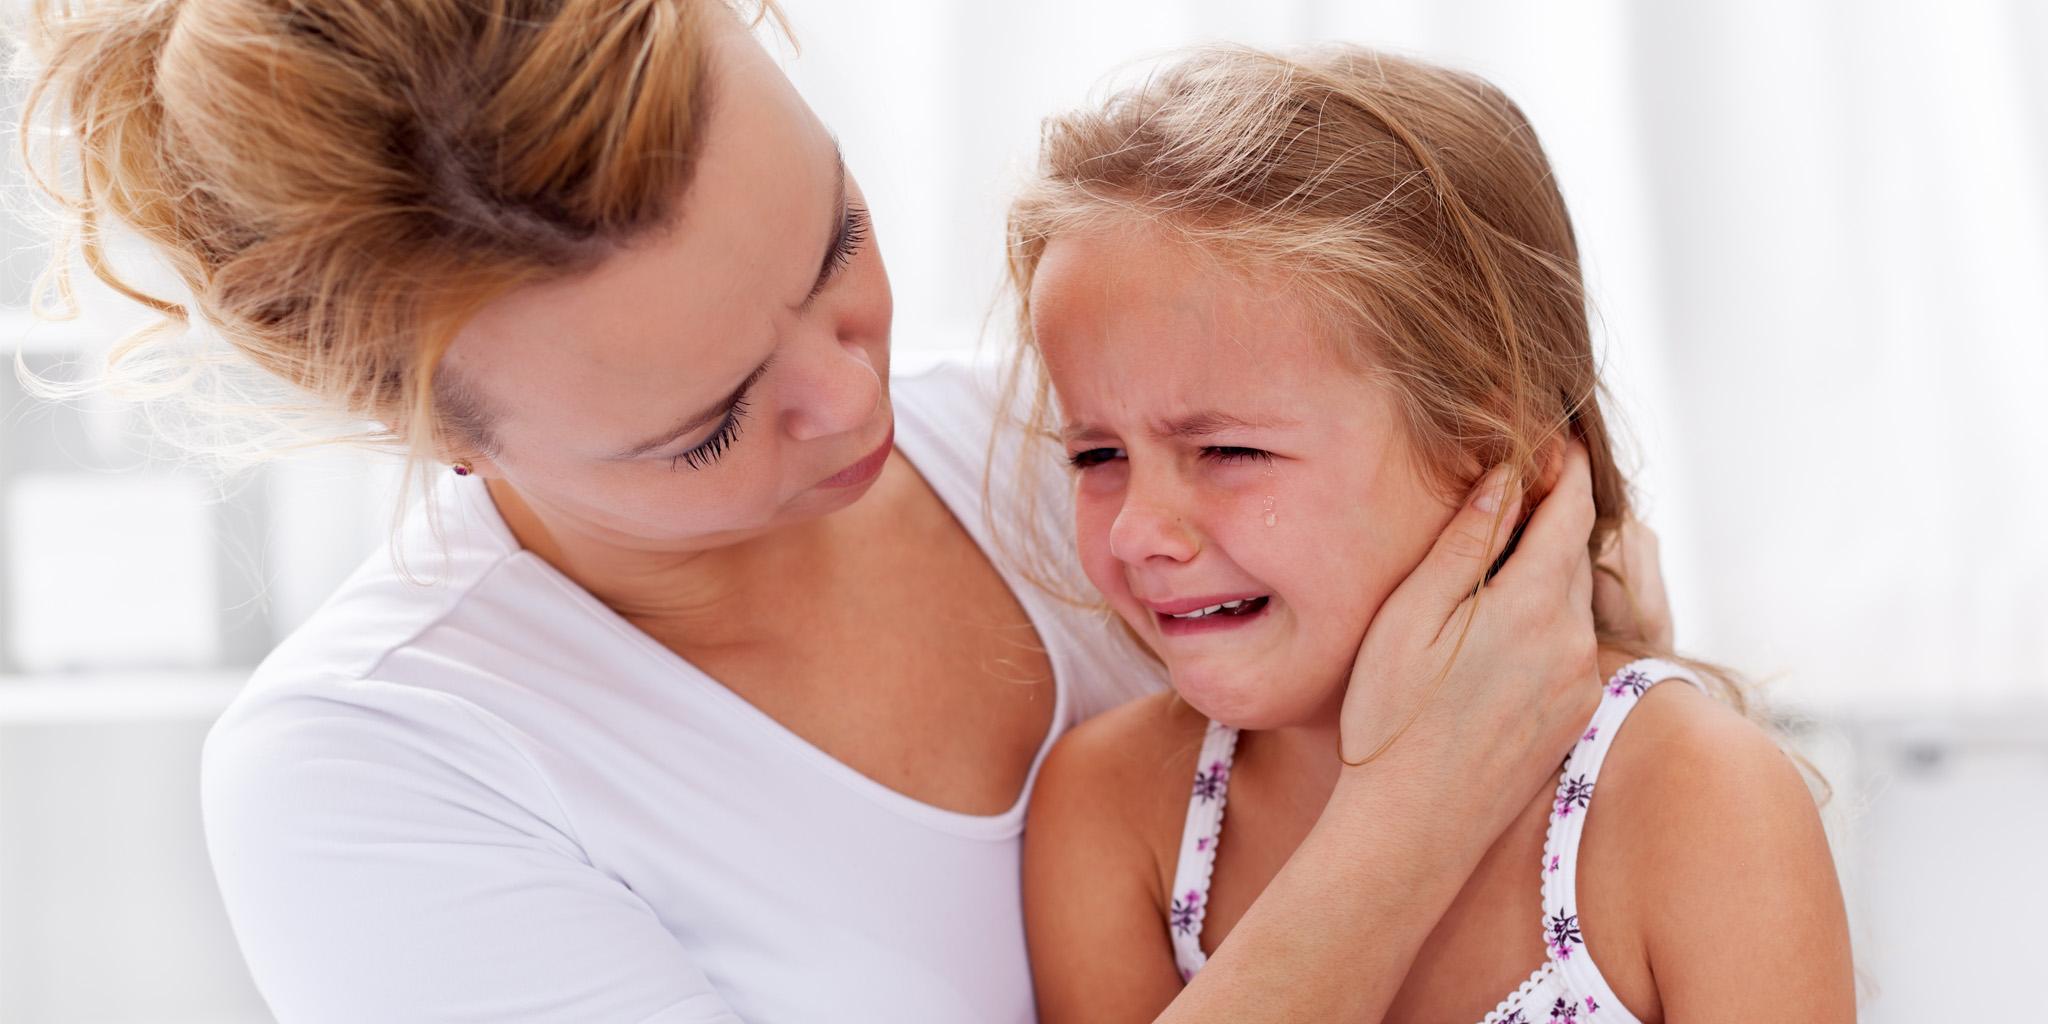 När ett barn blir mobbat